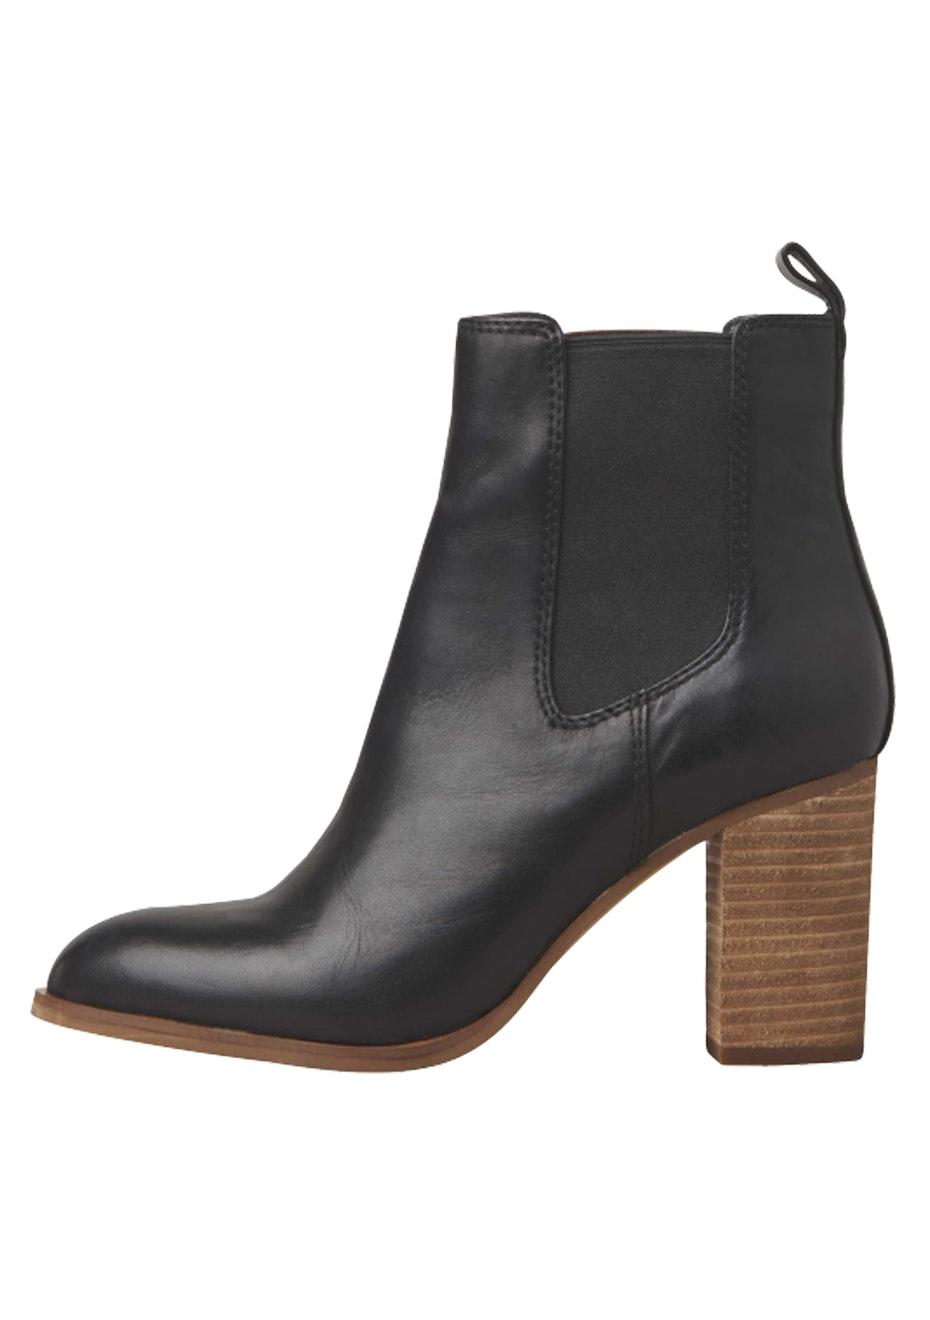 Windsor Smith - Guild - Black Leather